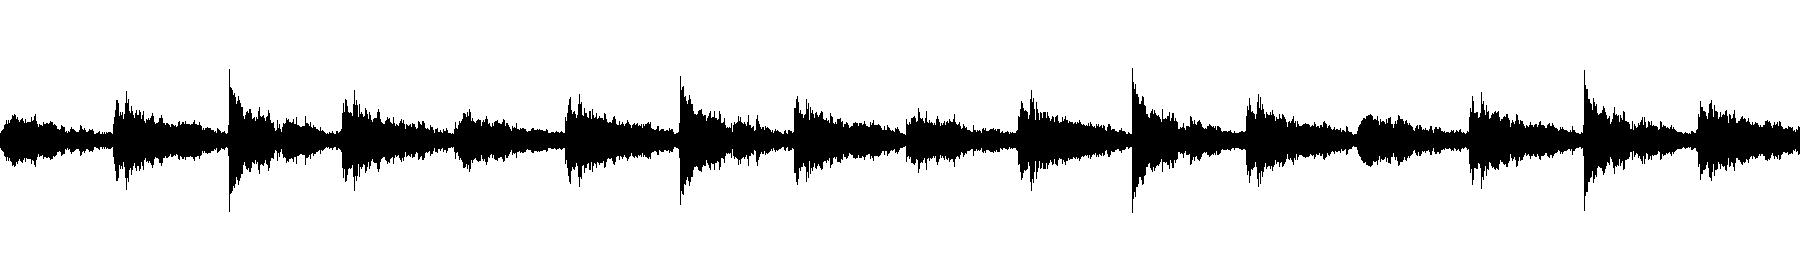 v31 vocal loop 71 b